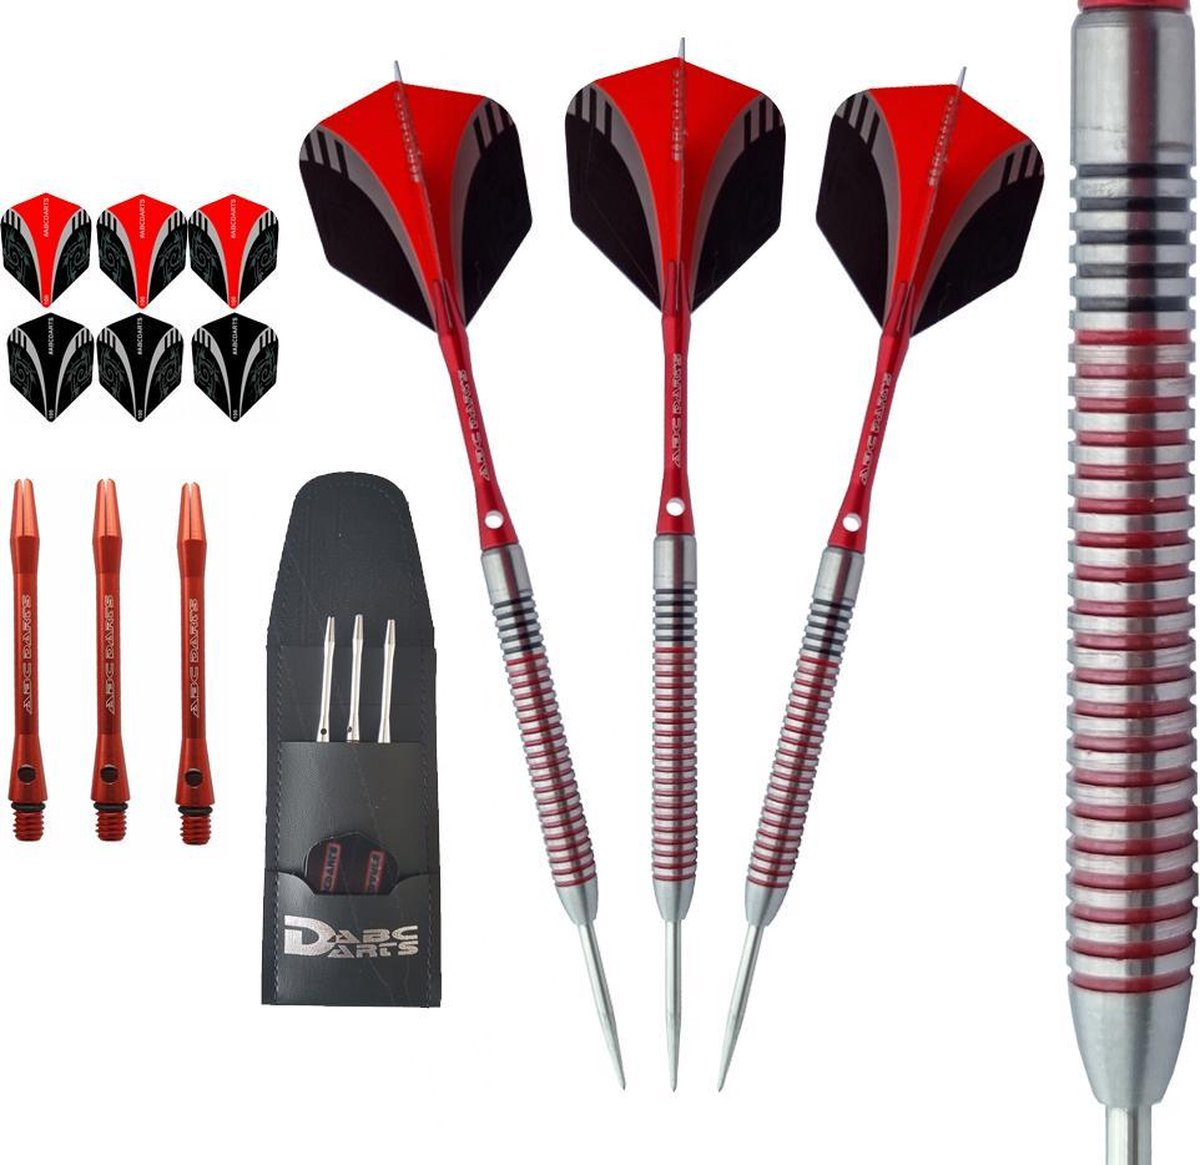 ABC Darts Professionele Dartpijlen - Red Dragonas Multi Ring - 22 gram